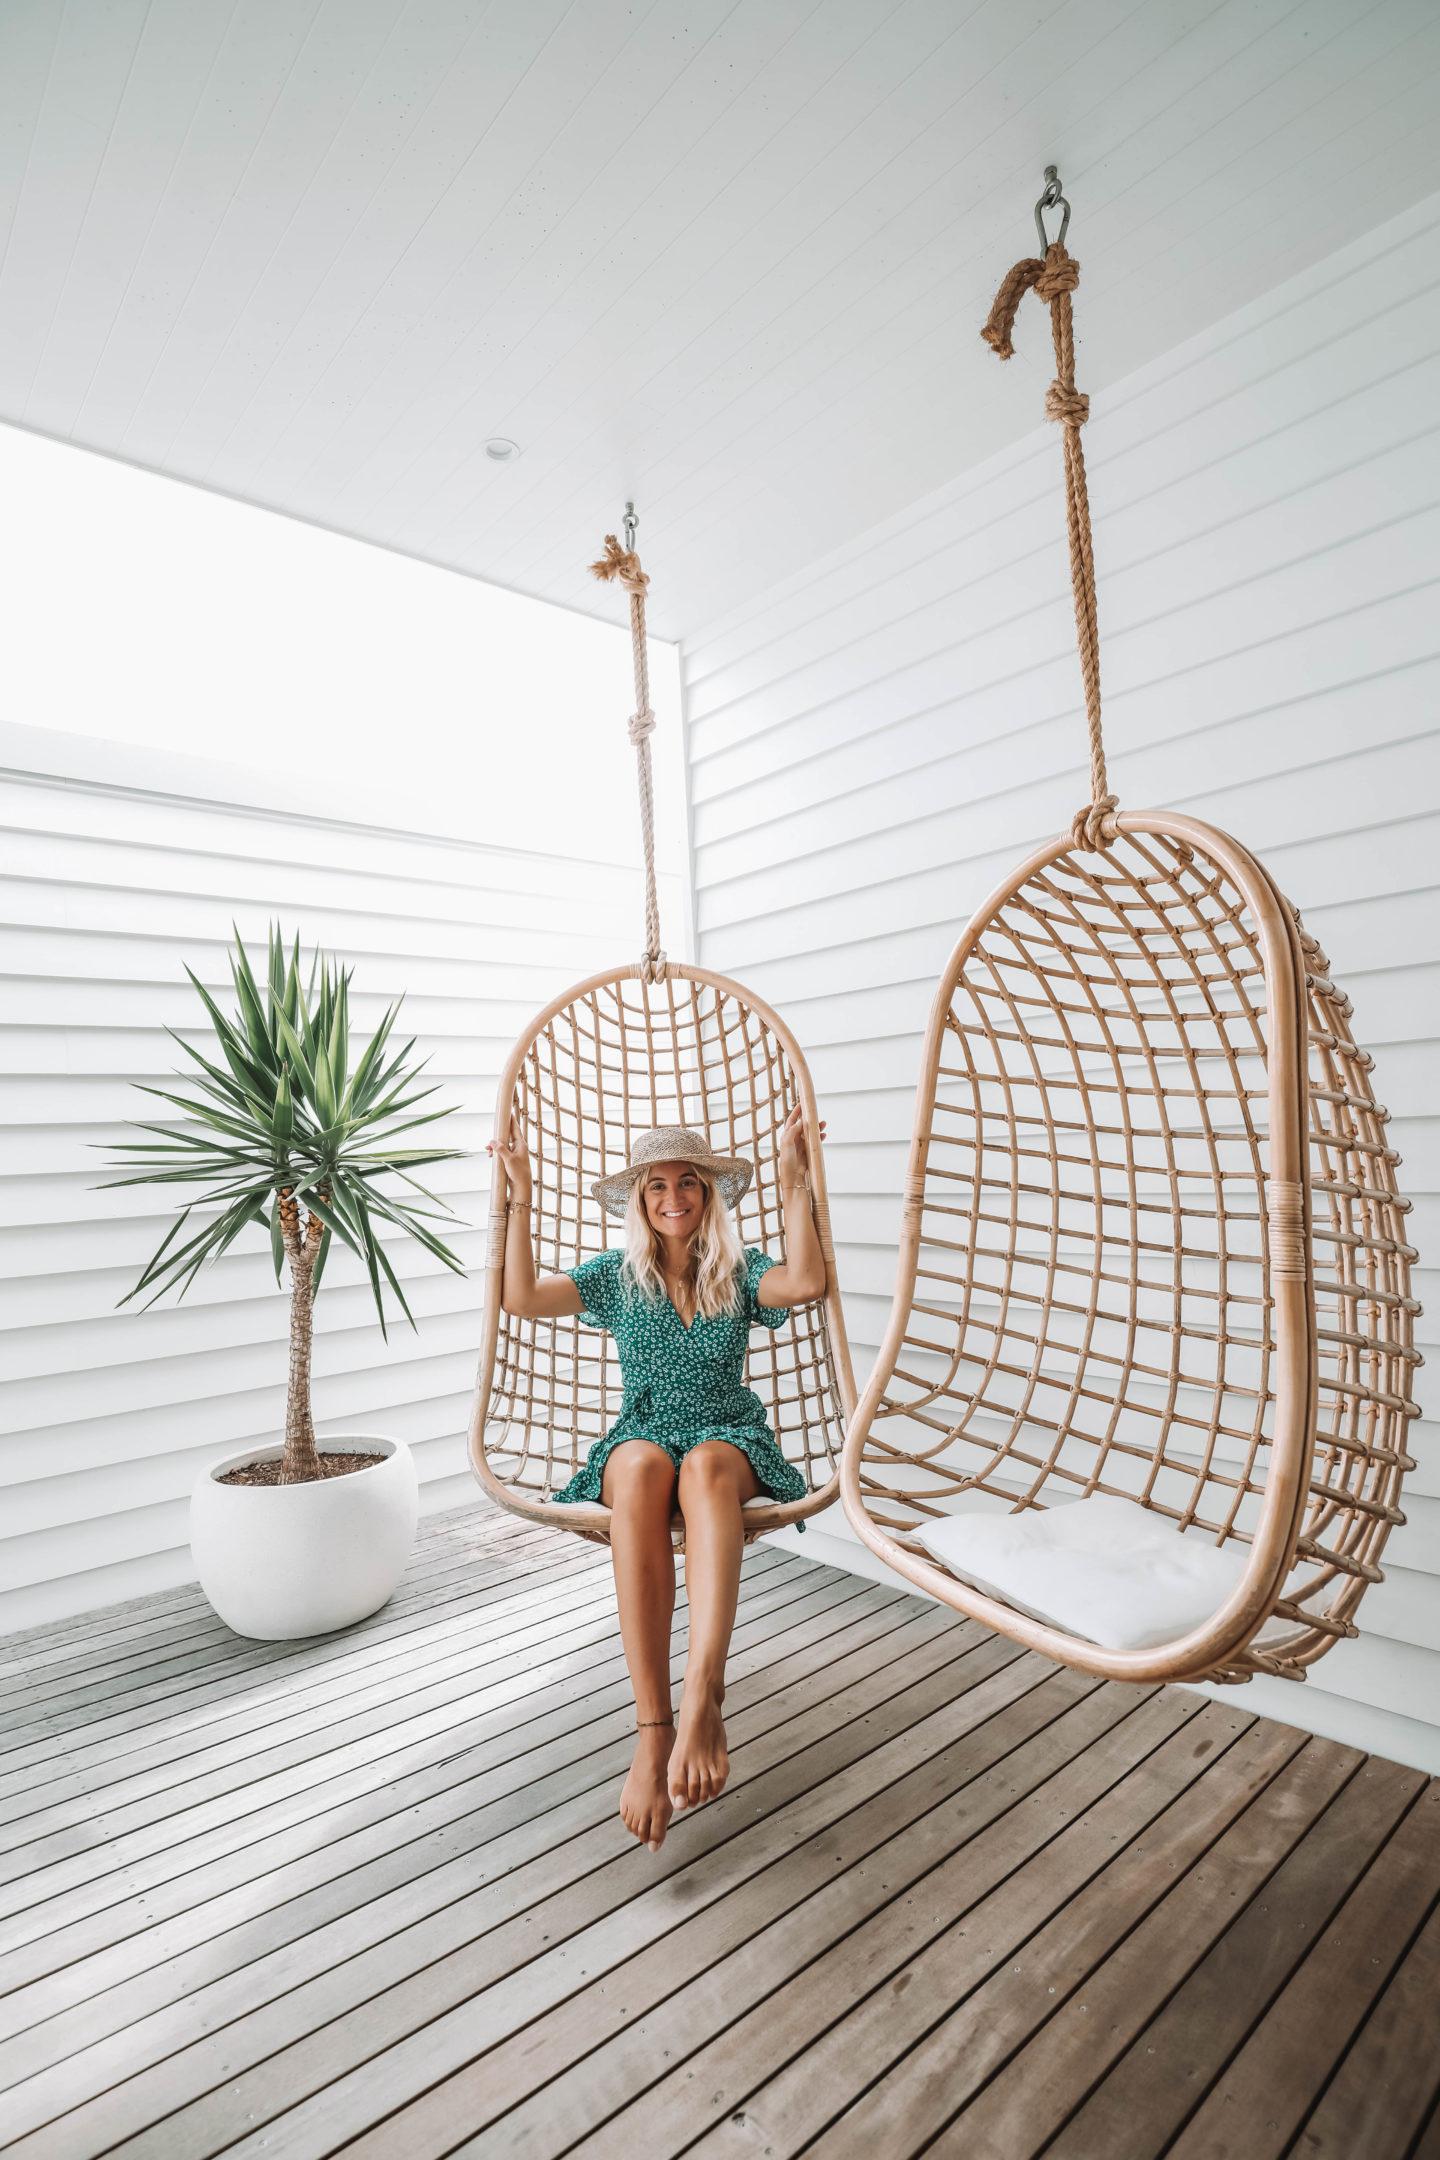 Air bnb Byron Bay - Blondie Baby blog mode et voyages